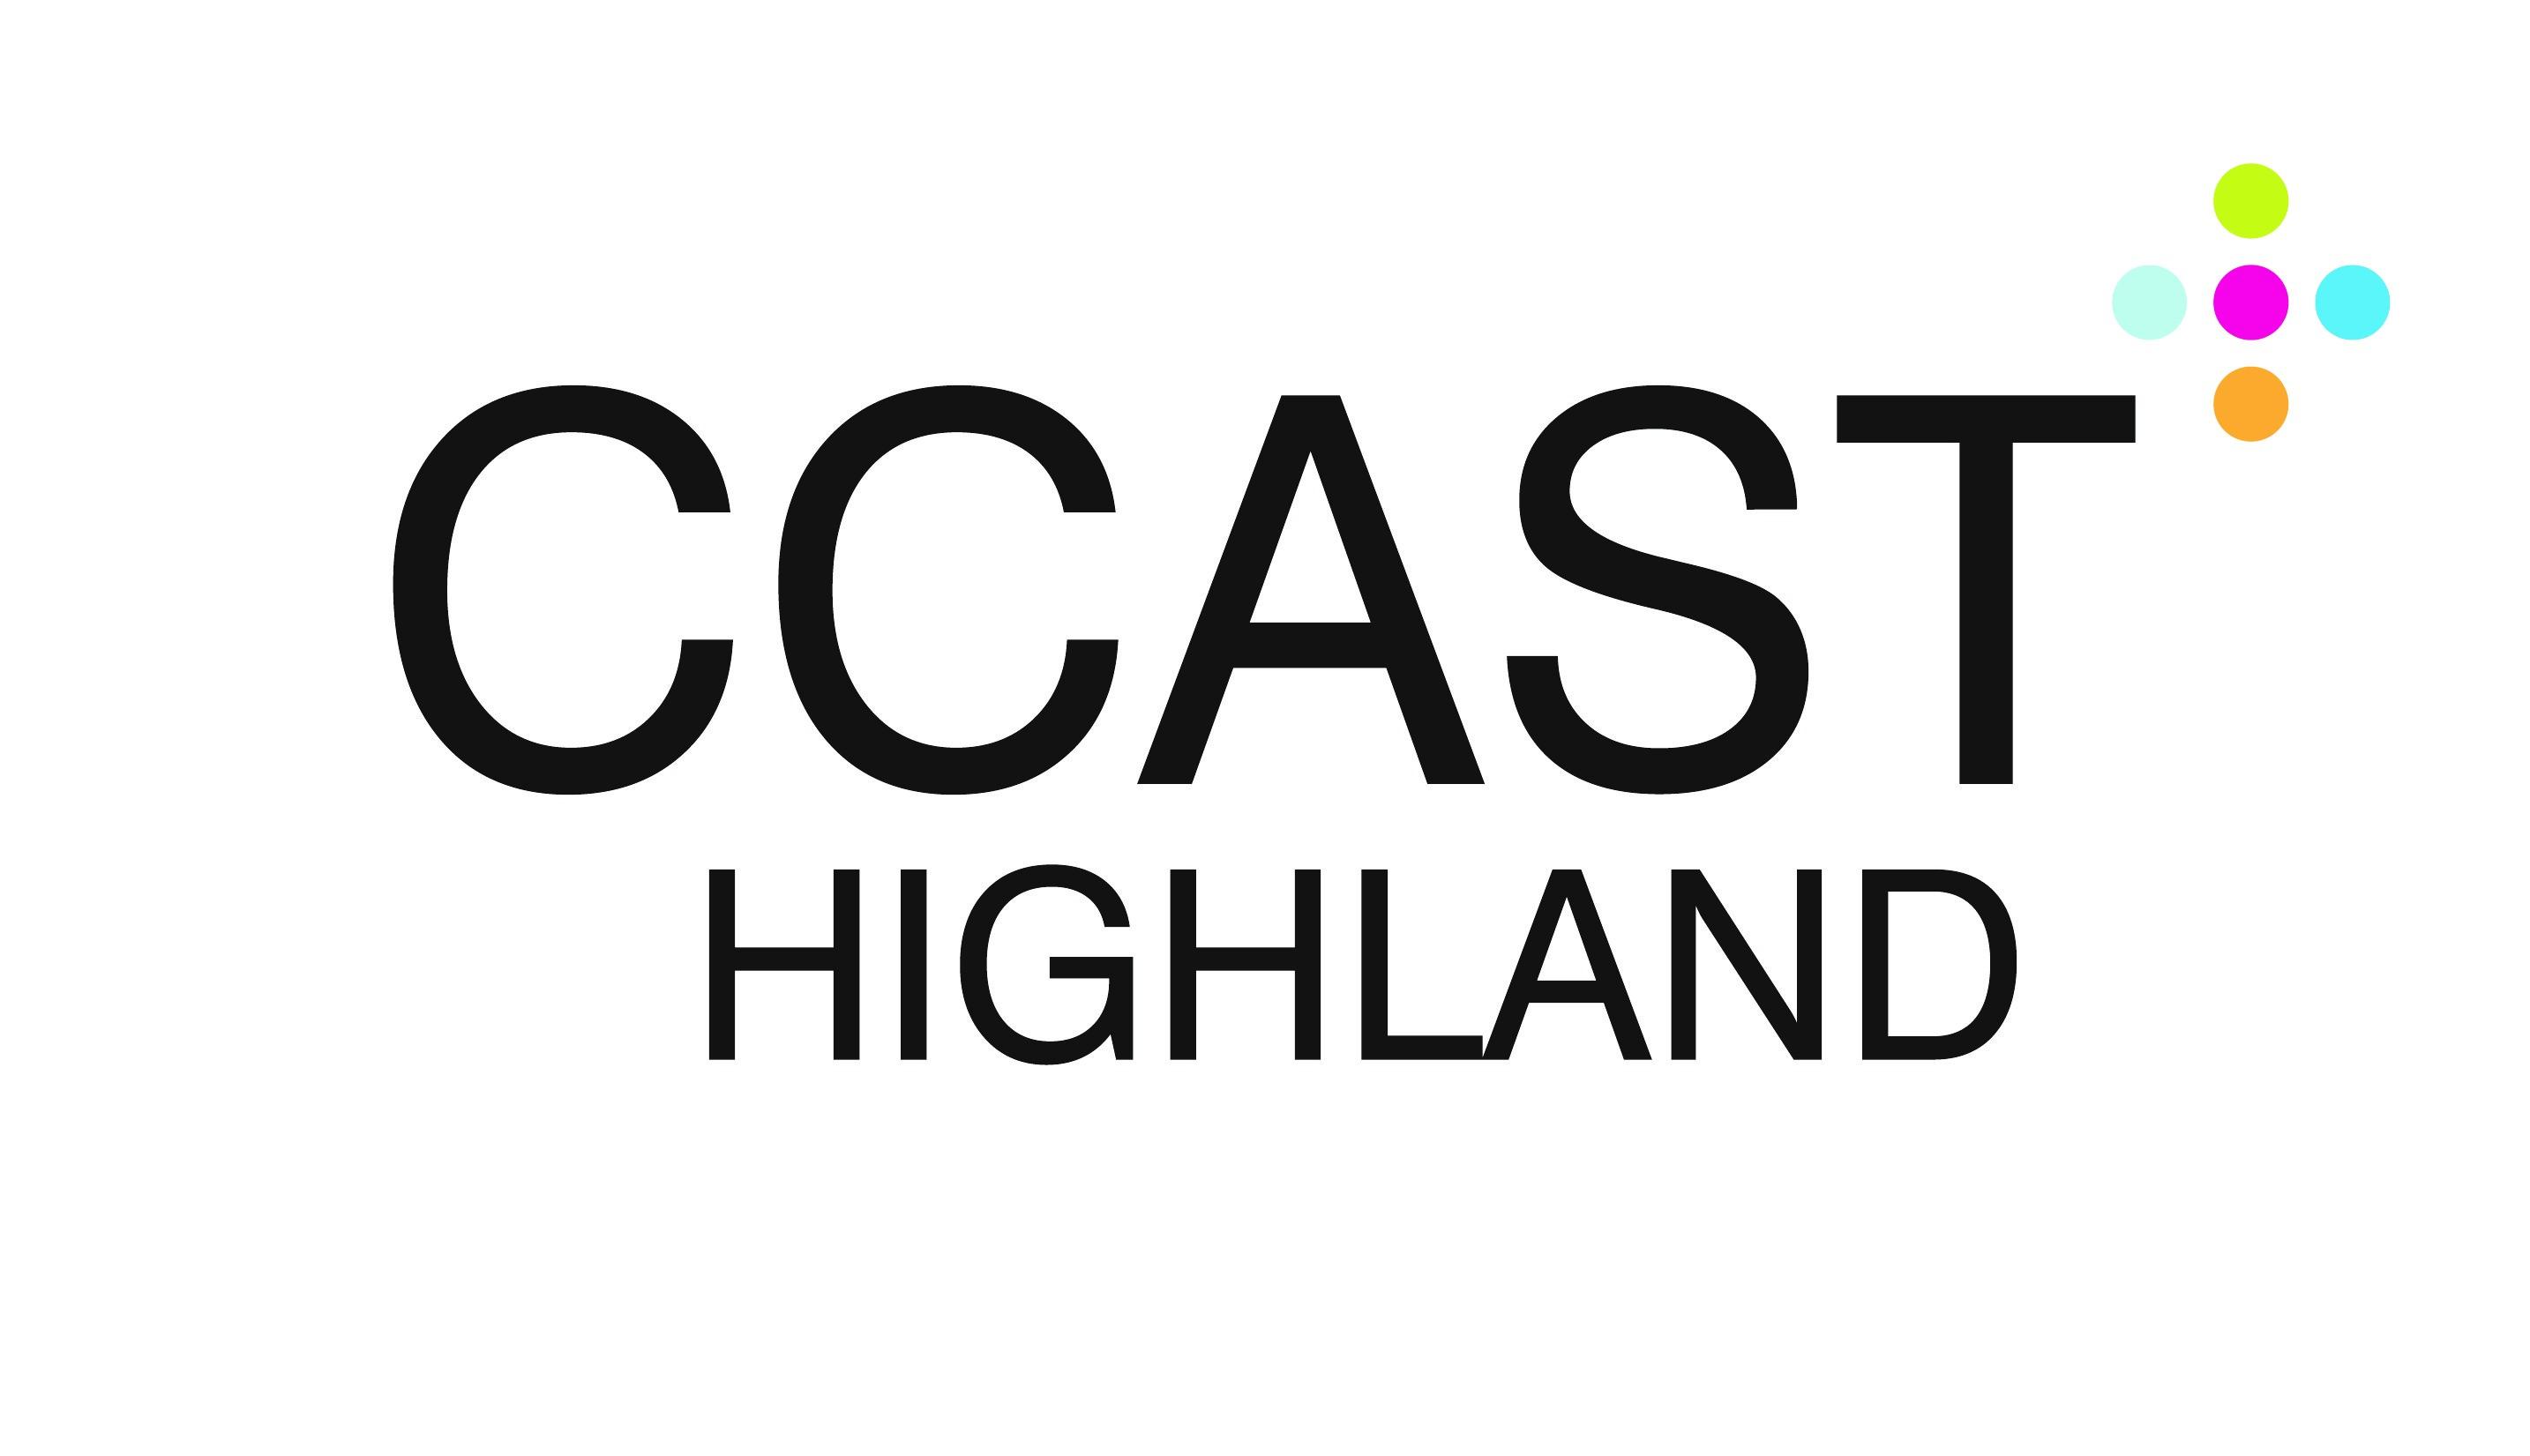 CCAST Highland